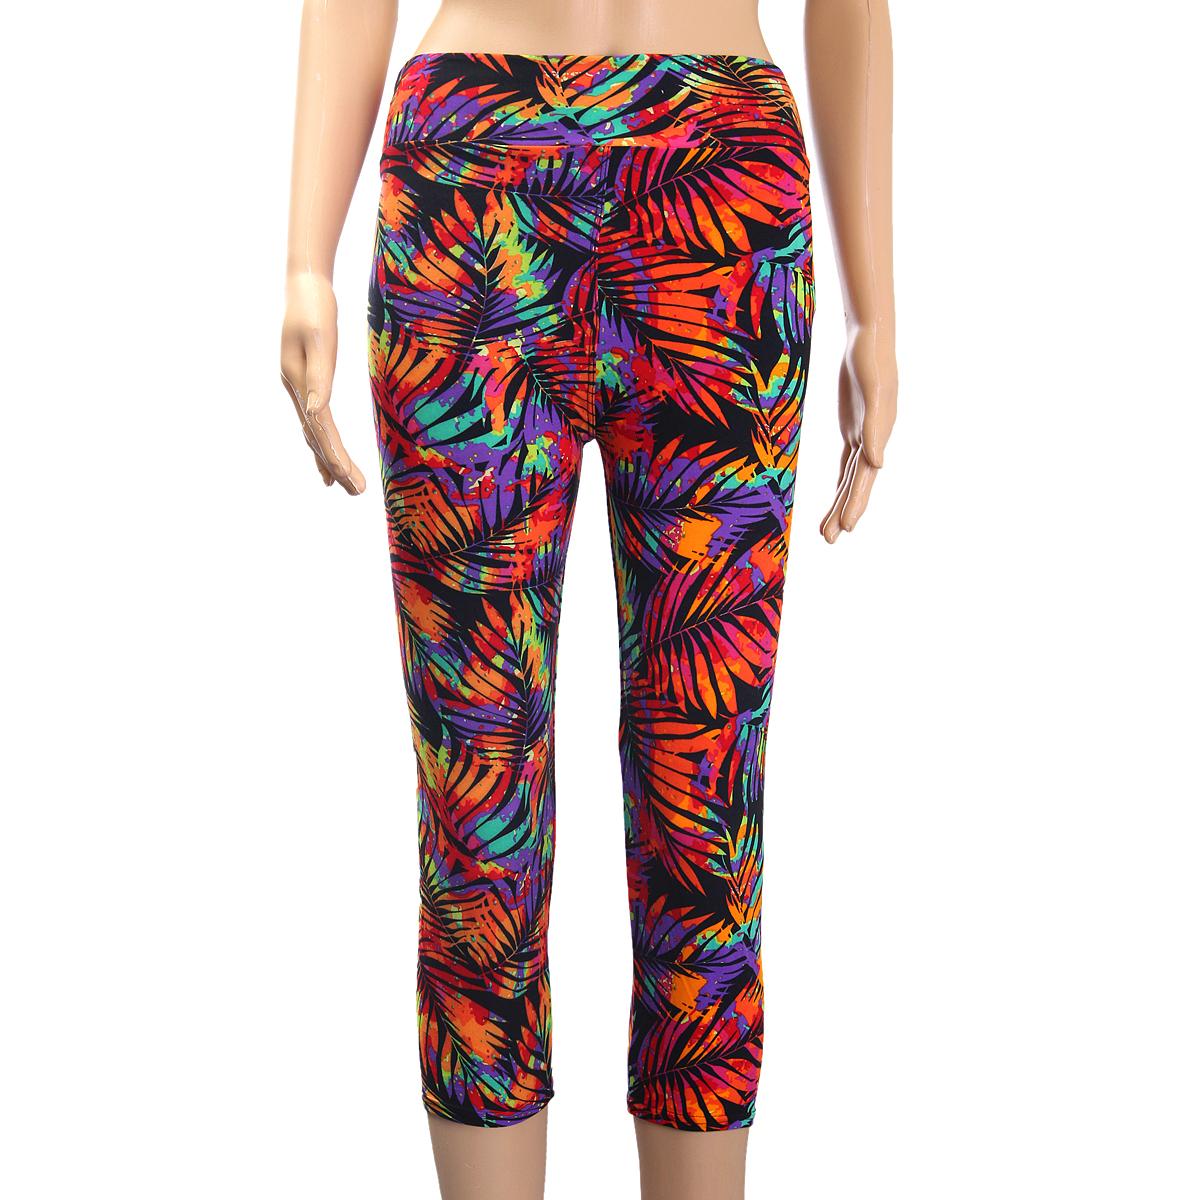 New Womens High Waist Fitness YOGA Sport Pants Printed